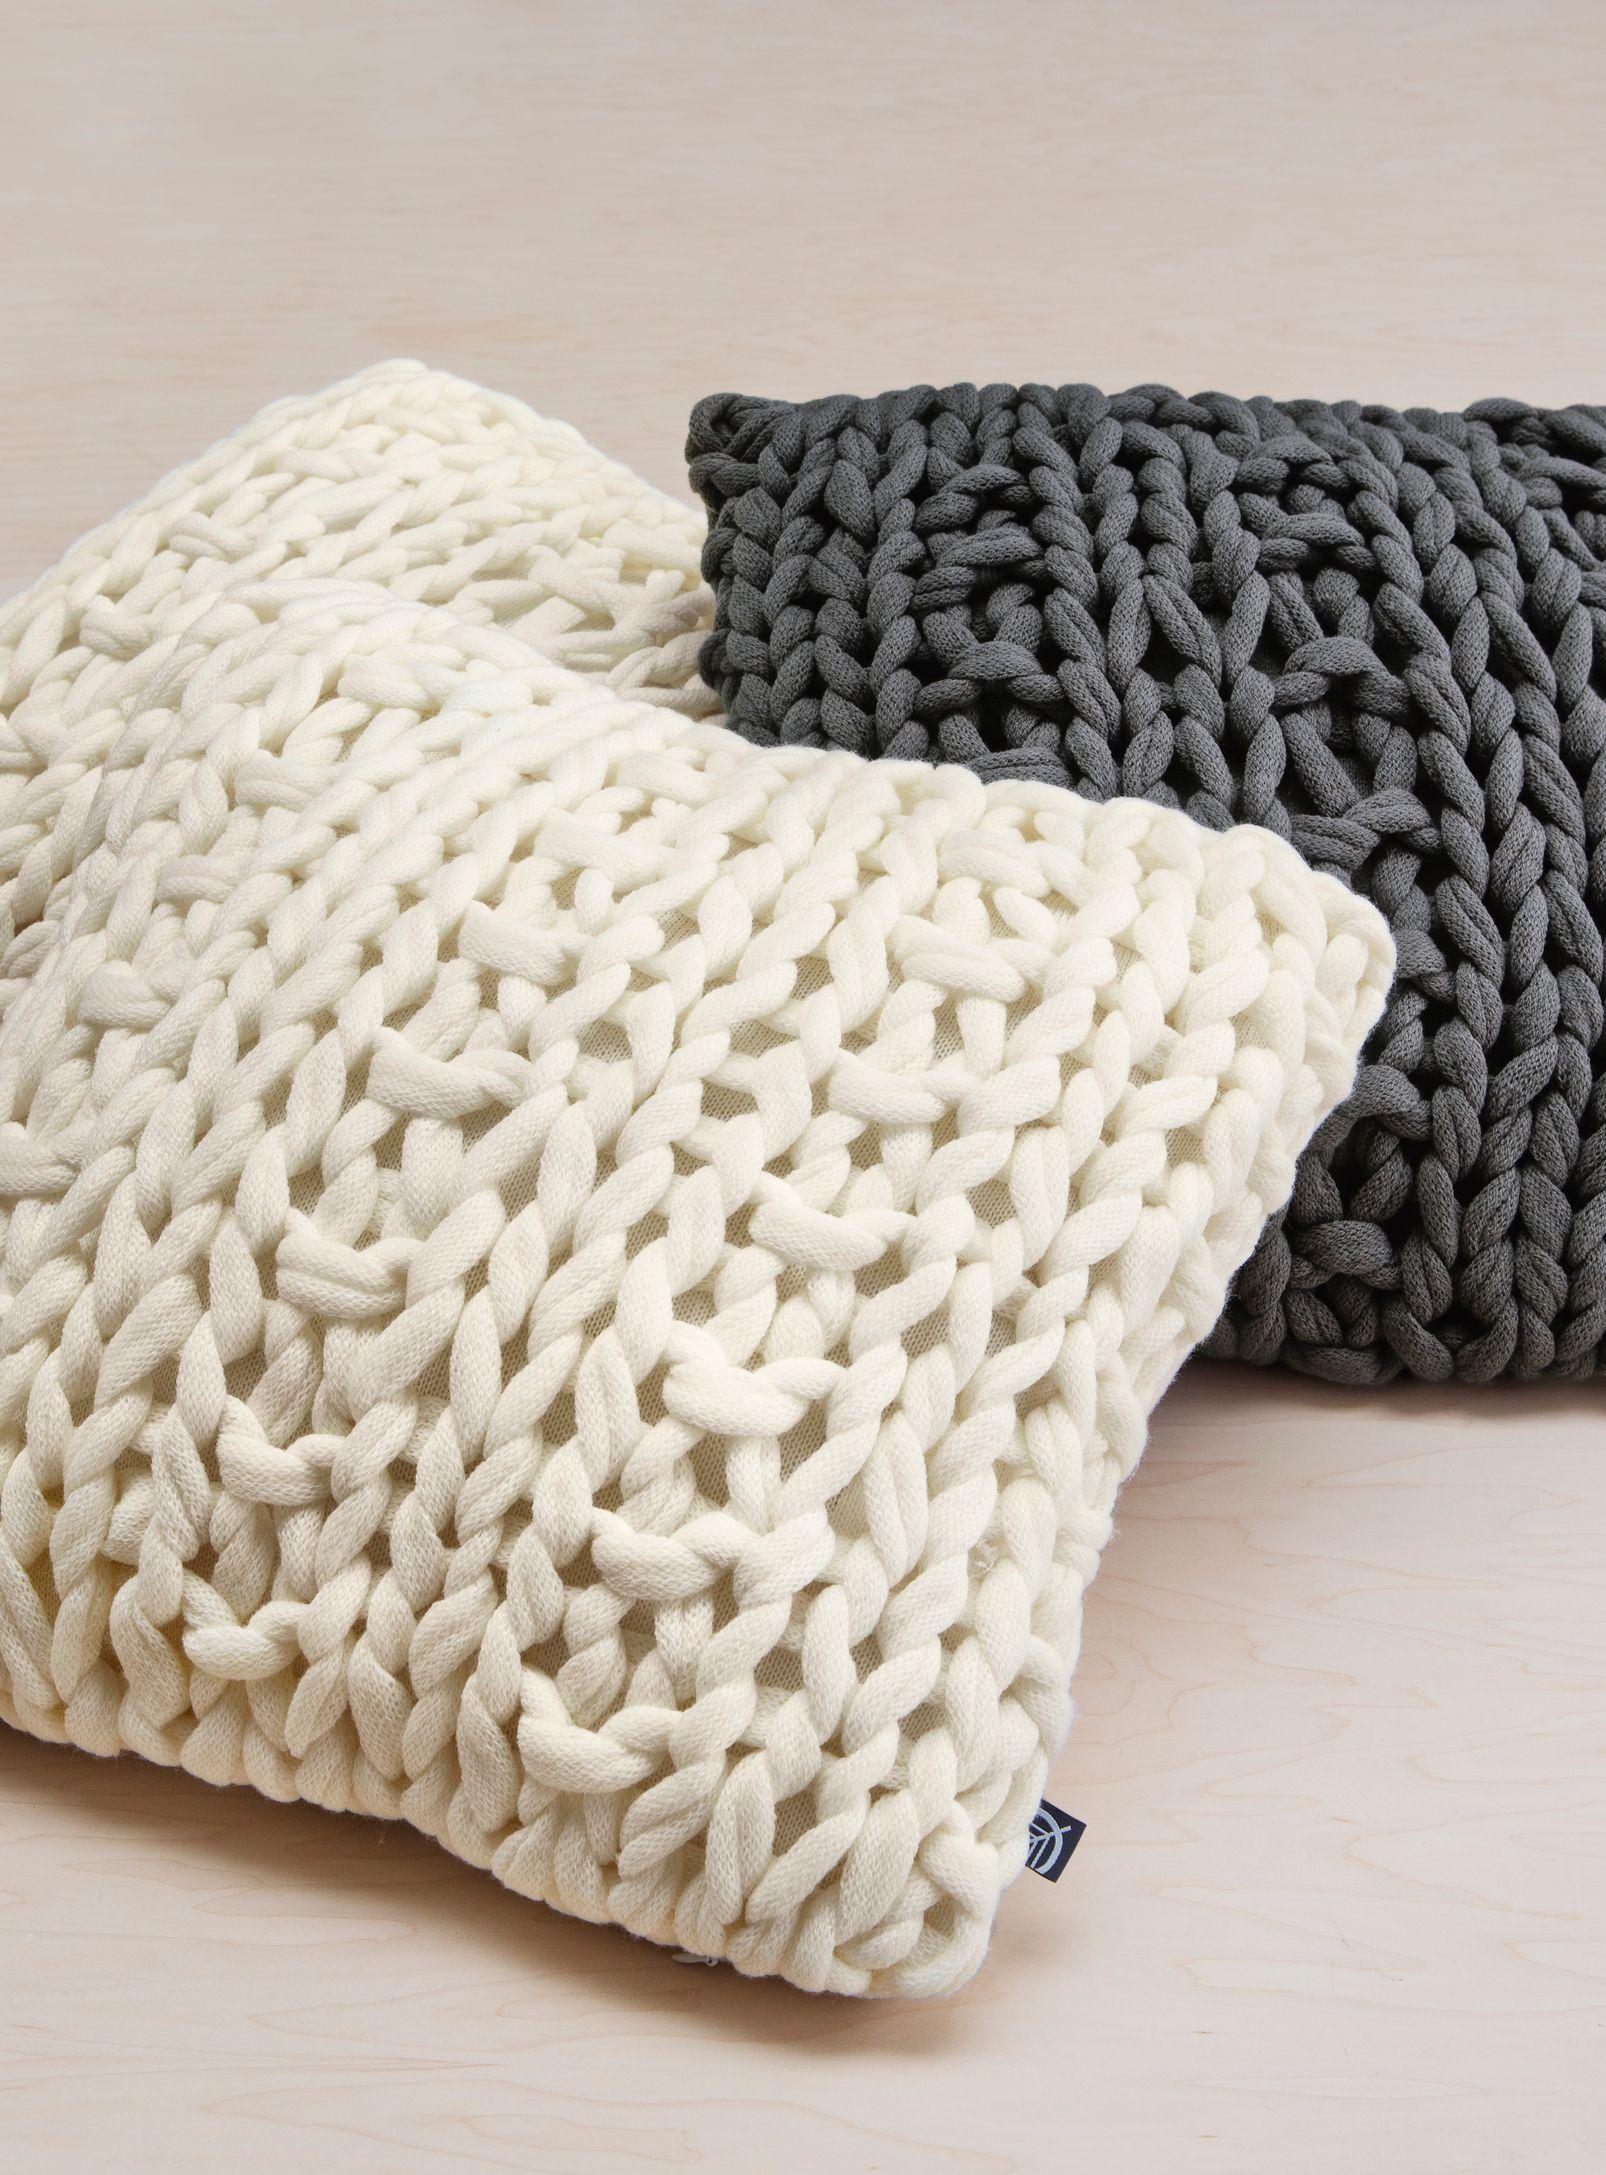 Chunky Knit Cushion Simons Decor Chalet Scandinavian Neutral Maisonsimons Knitted Cushions Scandinavian Cushions Knit Decor